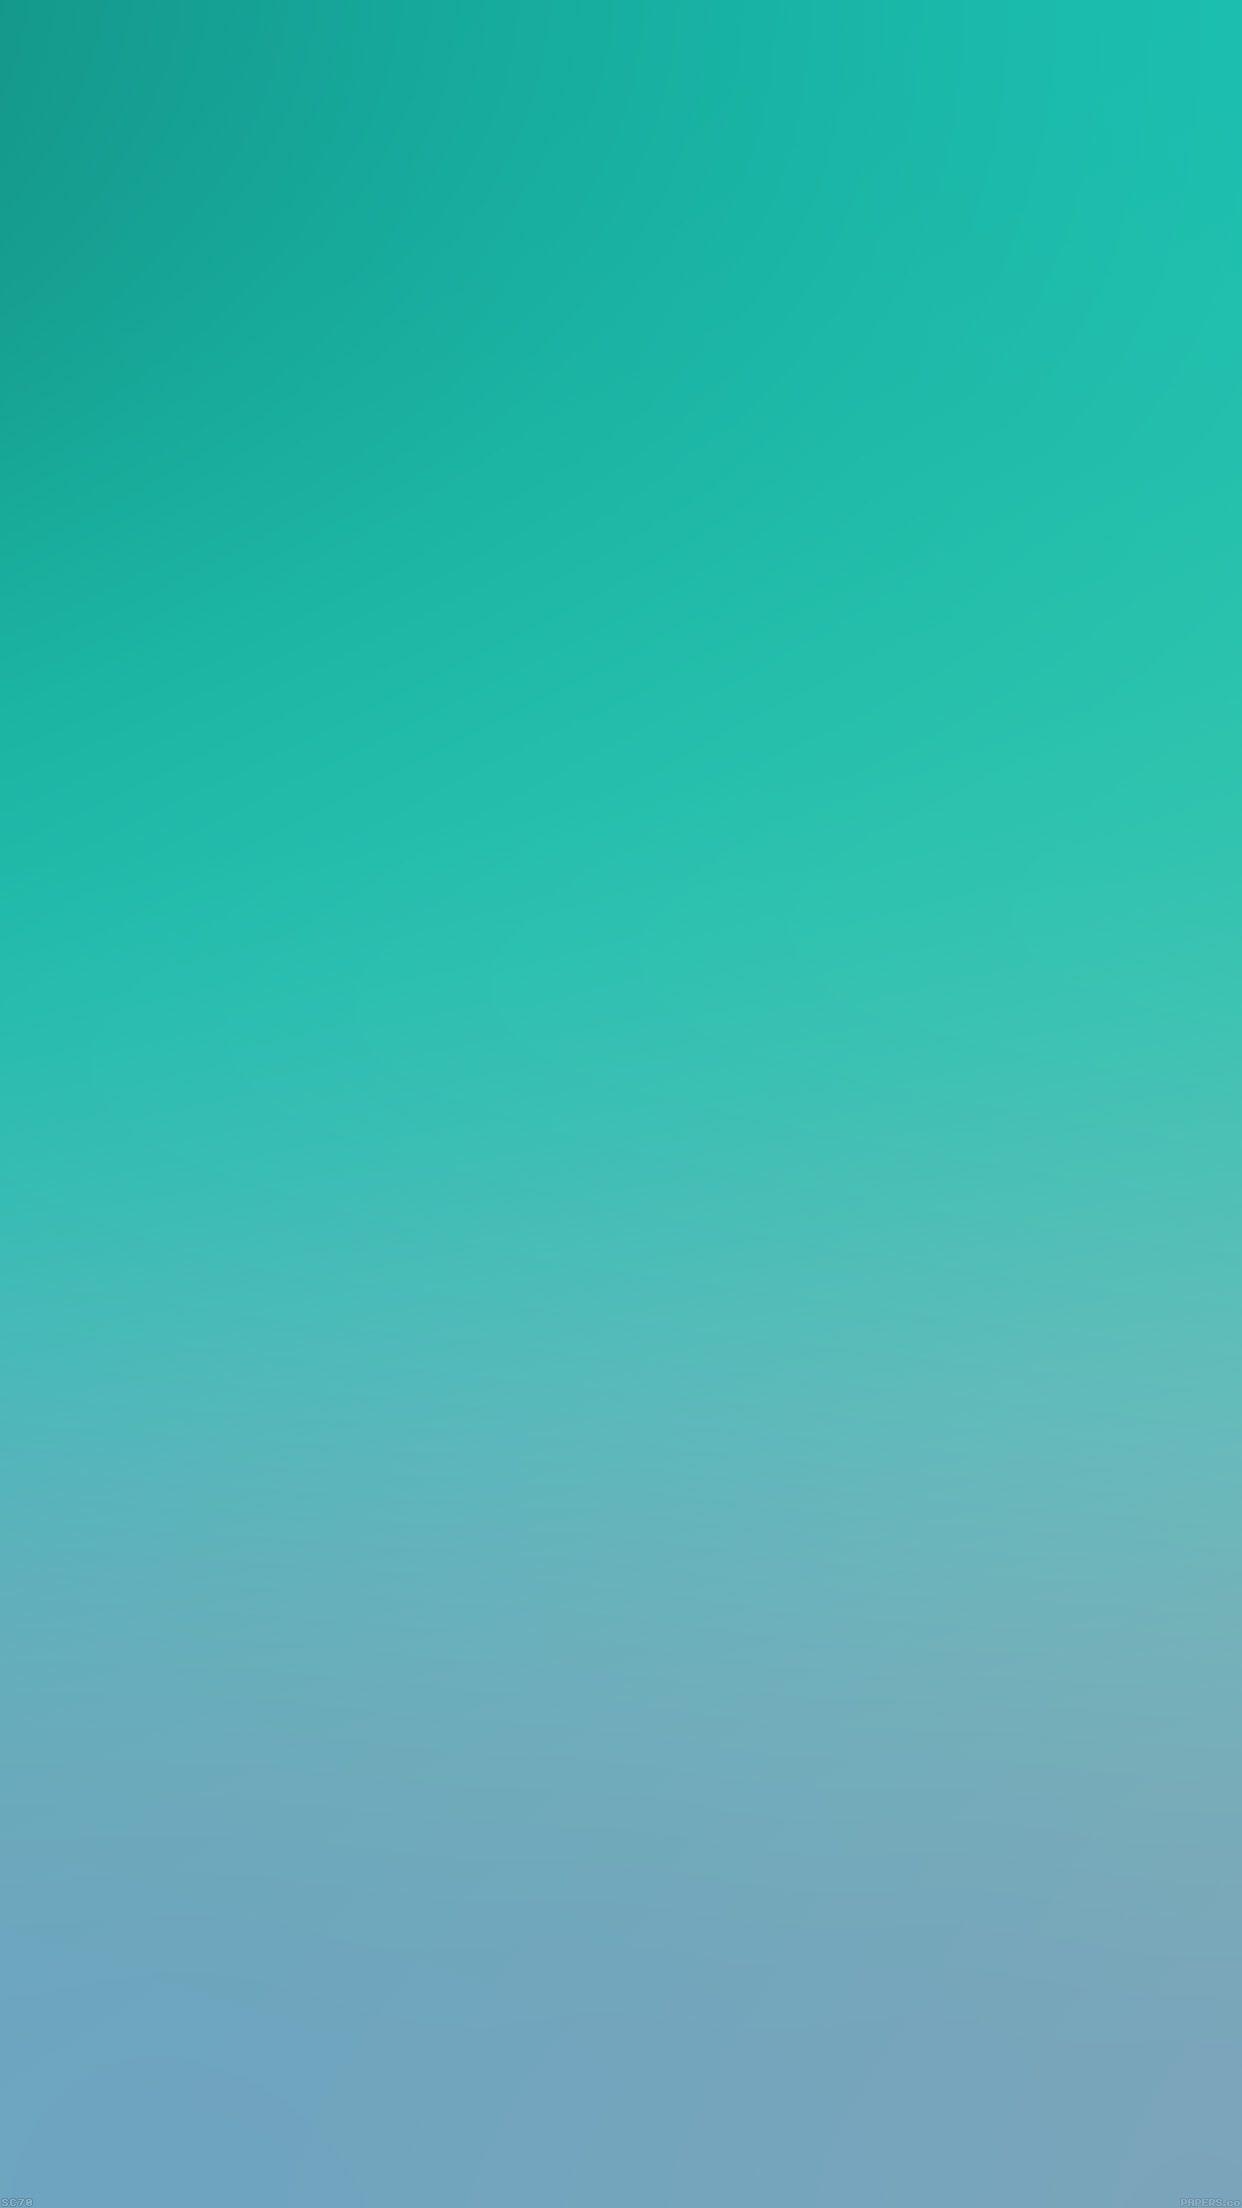 iphone 6 plus wallpaper retina gallery